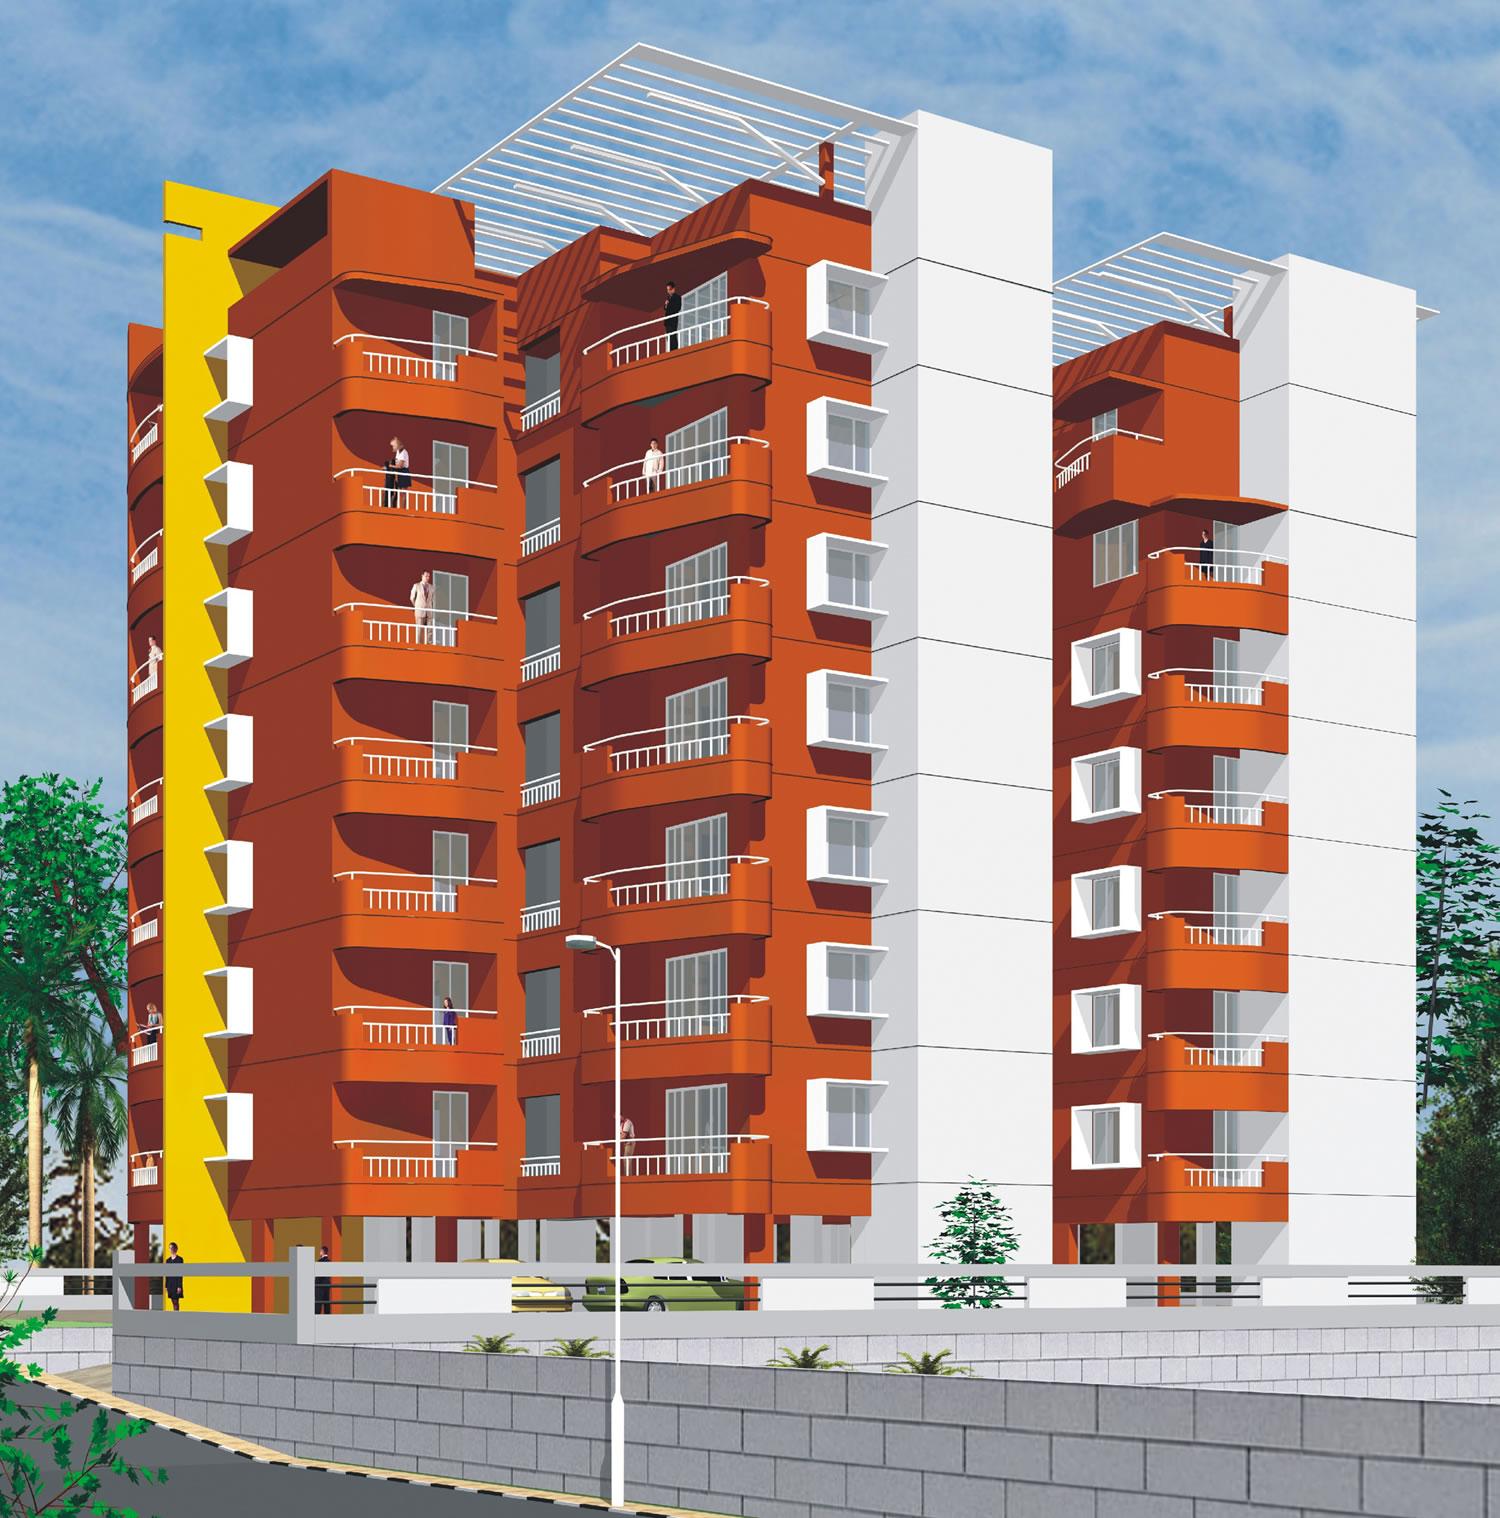 northernsky_tigris_flat_in_bunts_hostel_mangalore